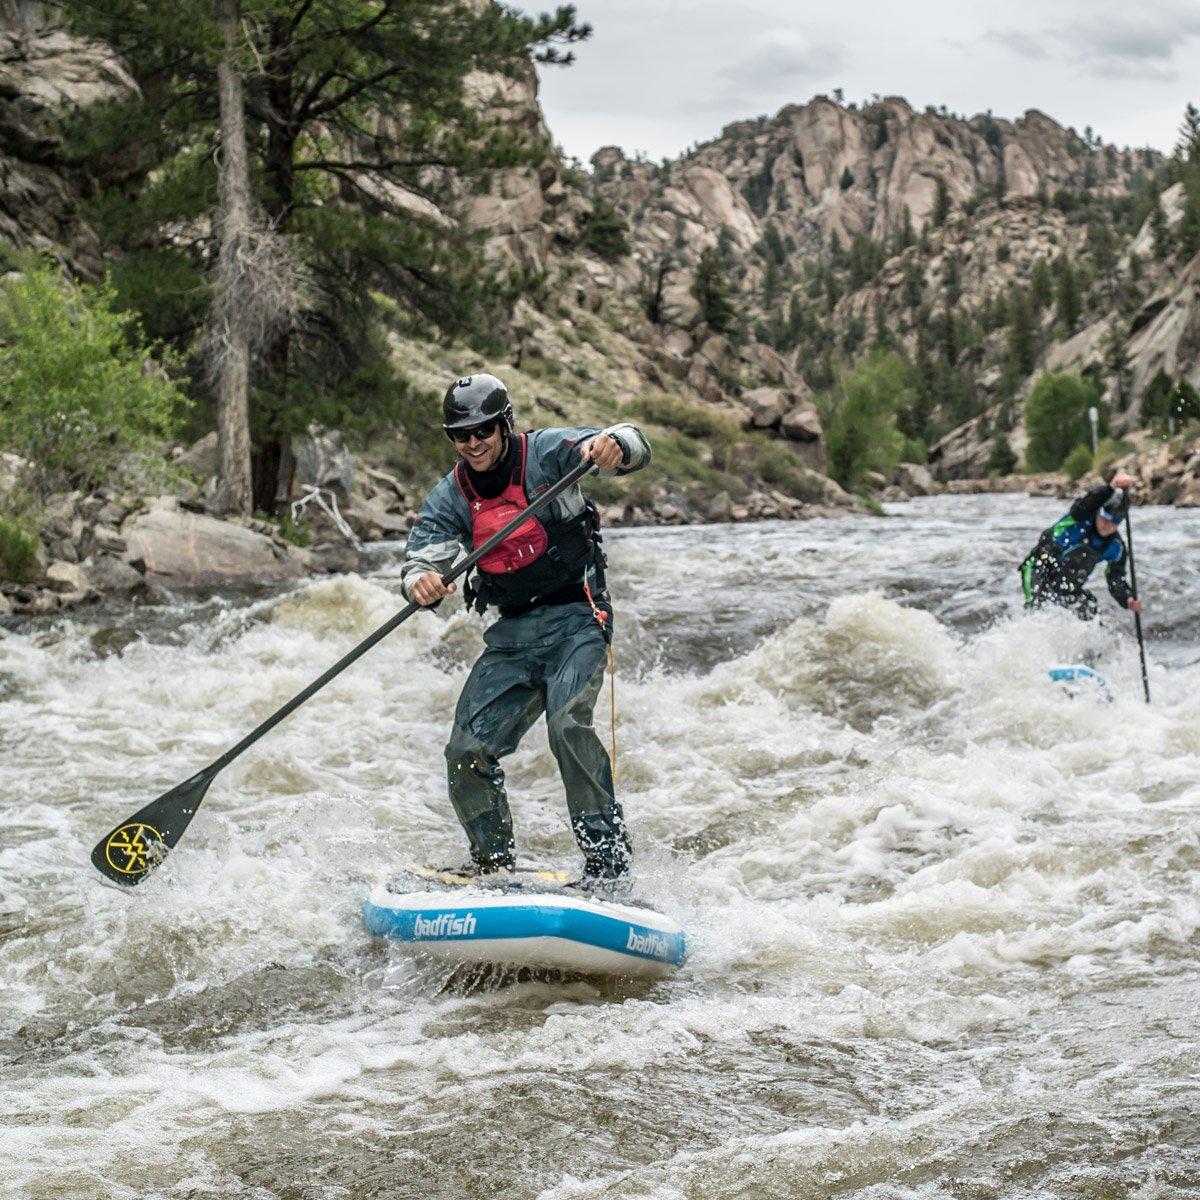 RiverShred paddling down the river on his Badfish SUP